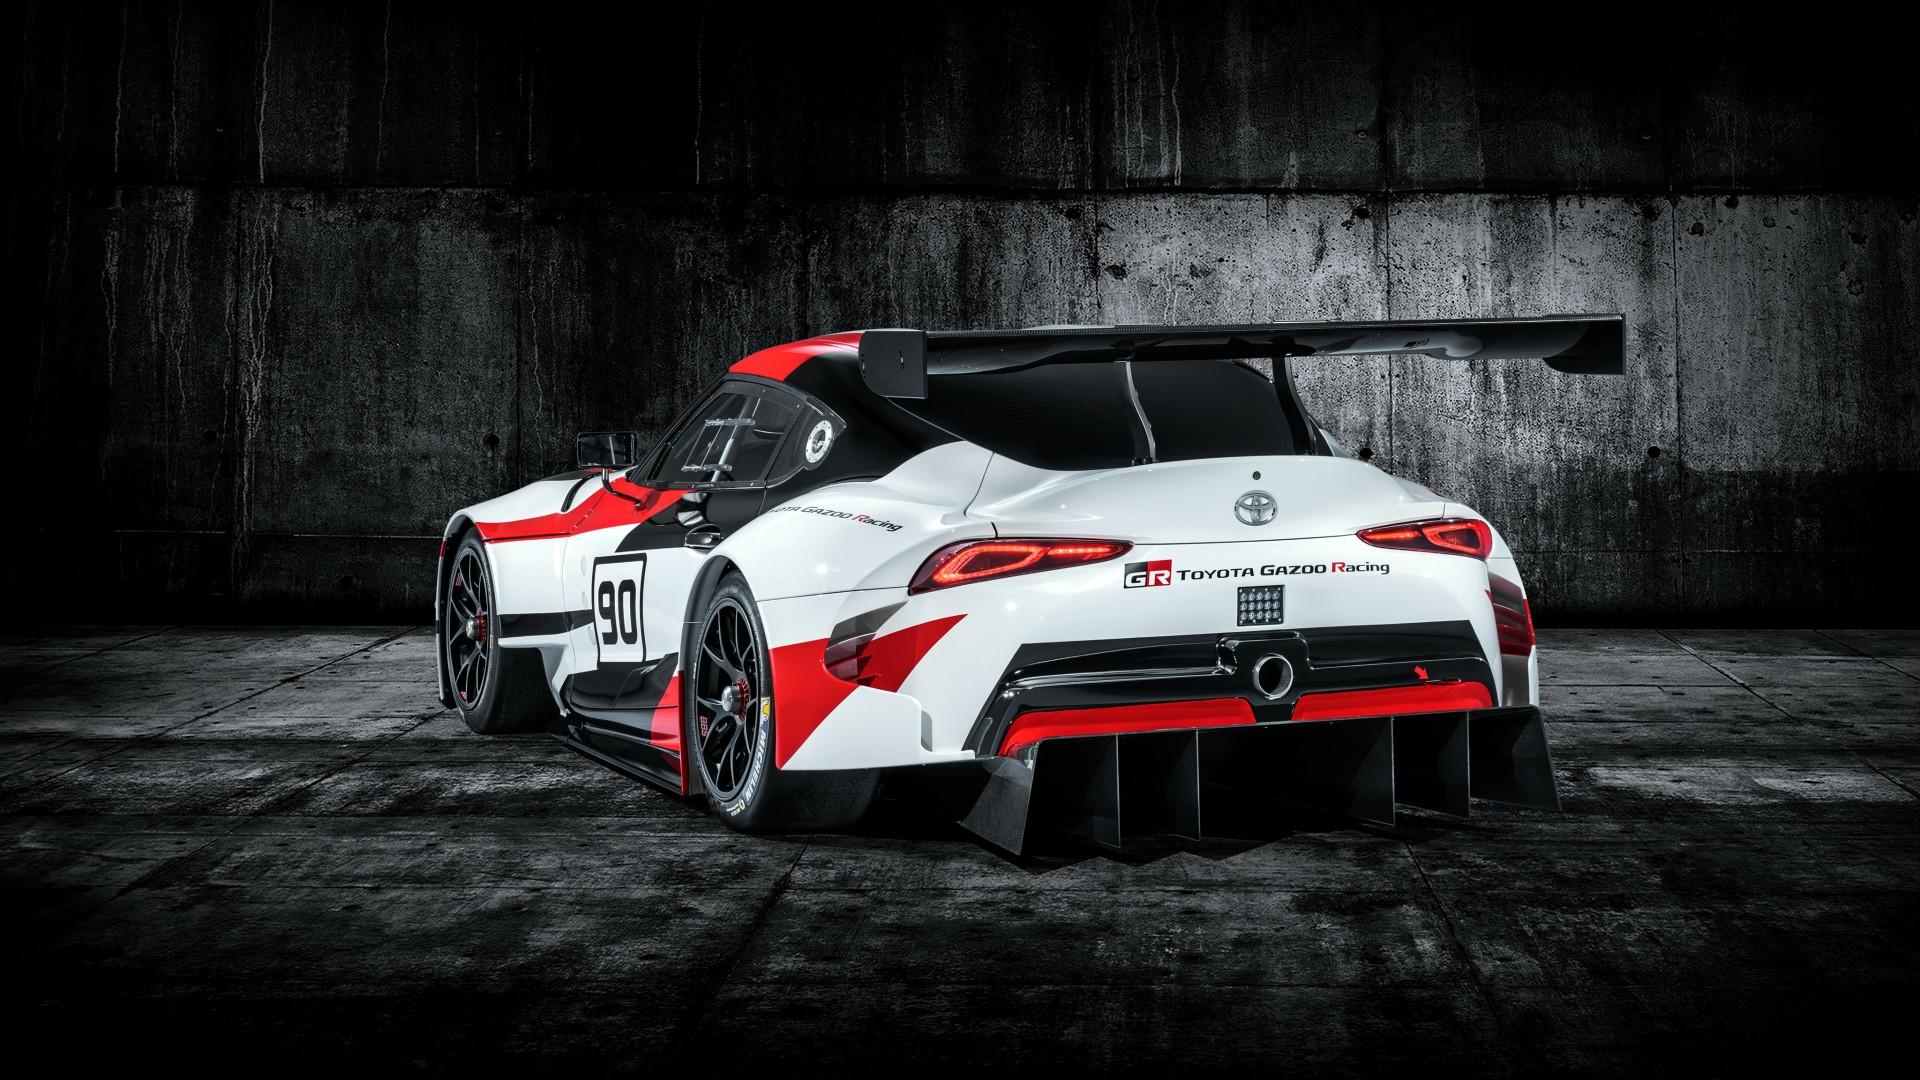 Toyota Ft 1 >> 2018 Toyota GR Supra Racing Concept 4K 9 Wallpaper | HD ...